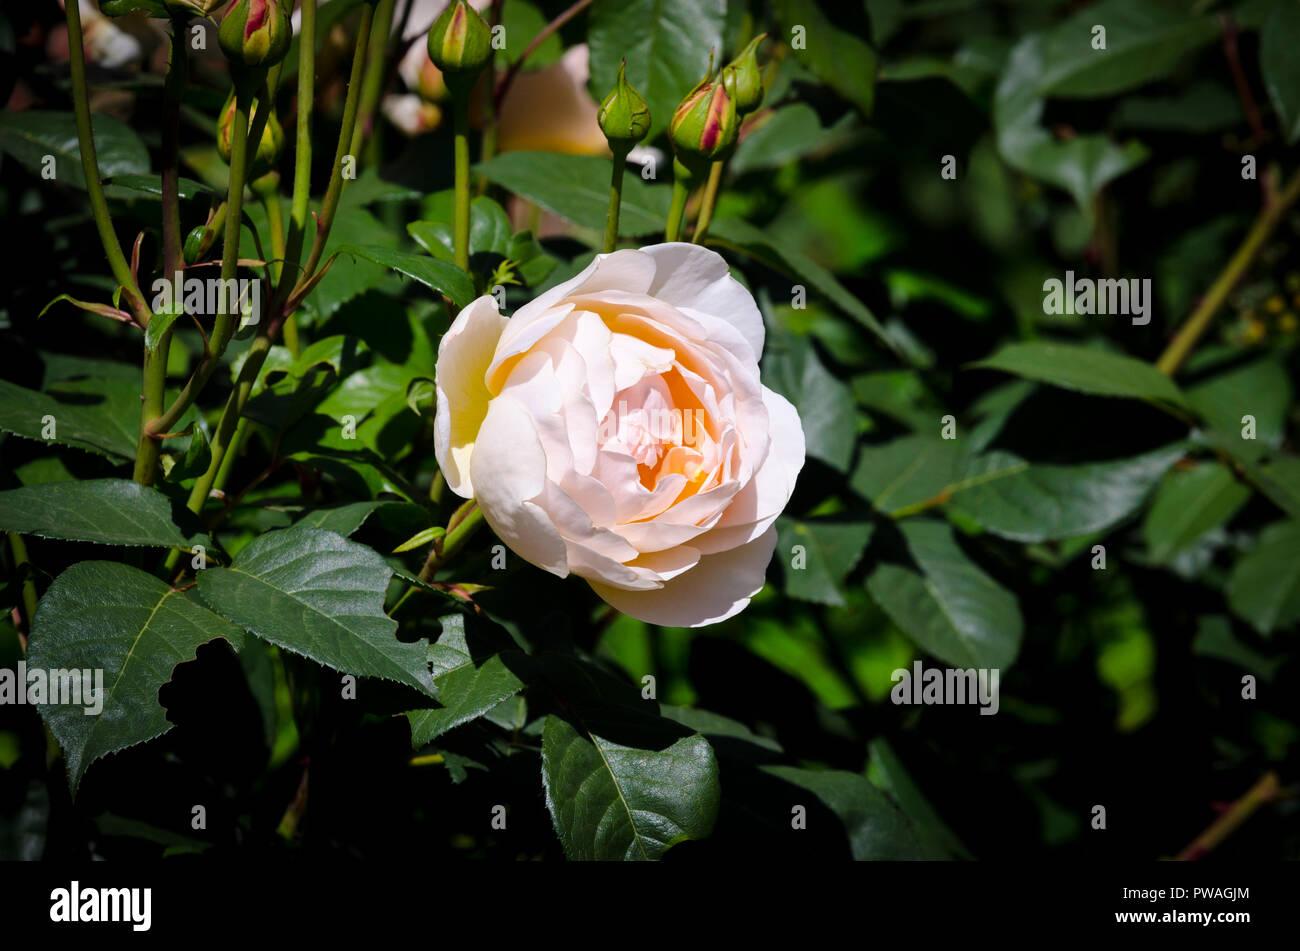 Peach rose, light pink rose, Rosa, Rosoideae, Rosaceae - Stock Image